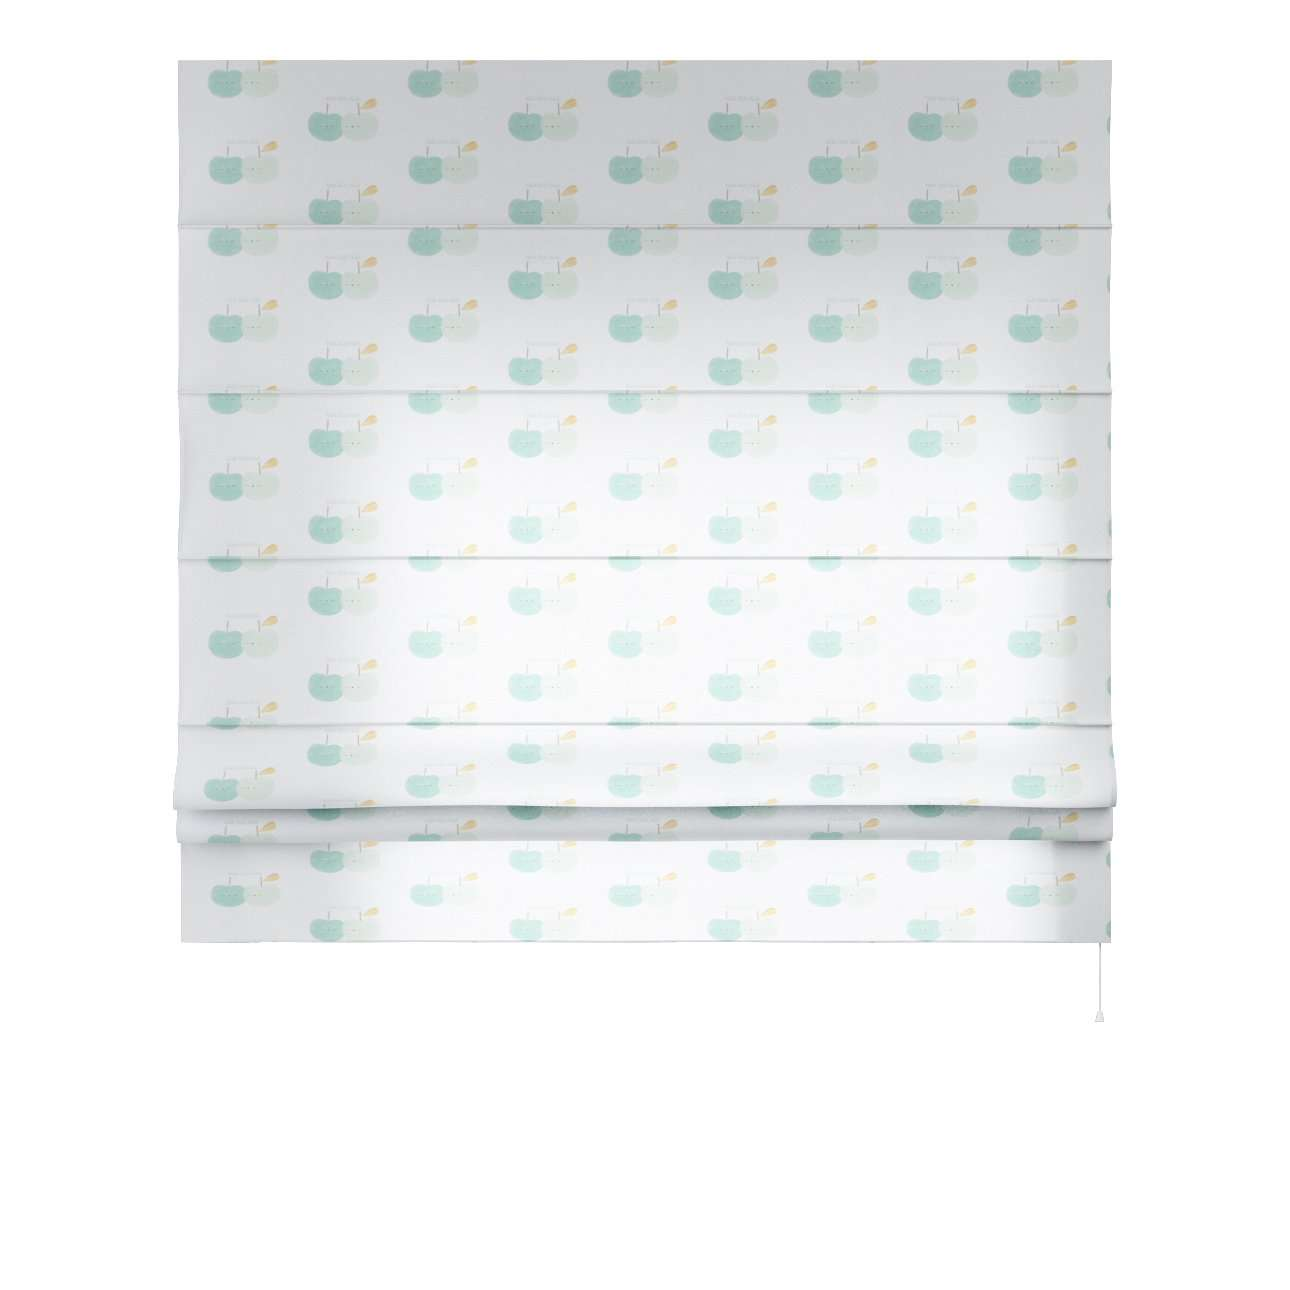 vouwgordijn Padva 80 x 170 cm van de collectie Apanona, Stof: 151-02